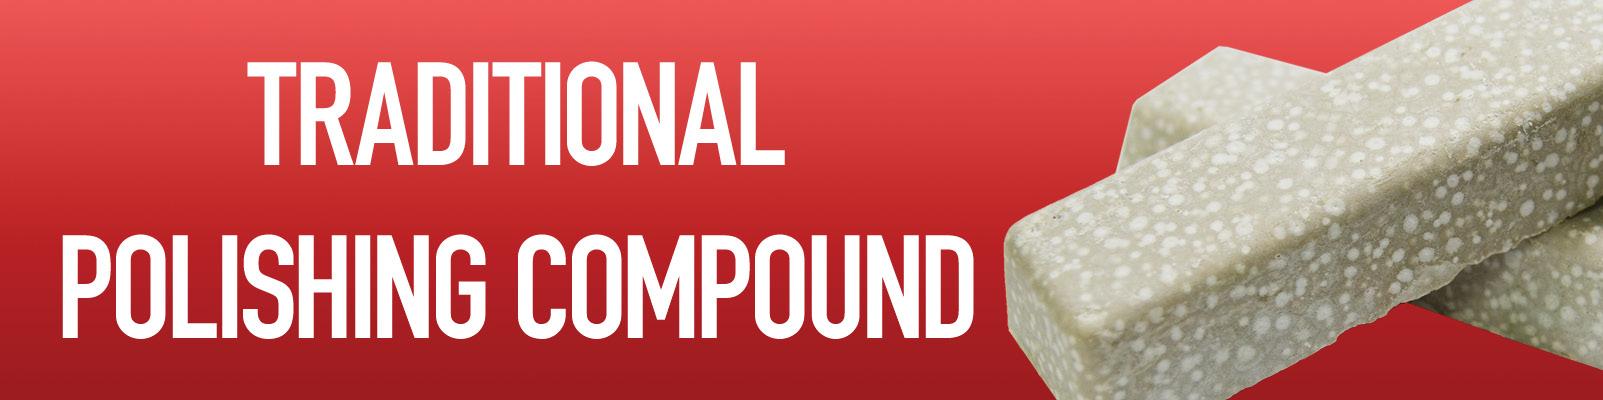 Traditional Polishing Compound